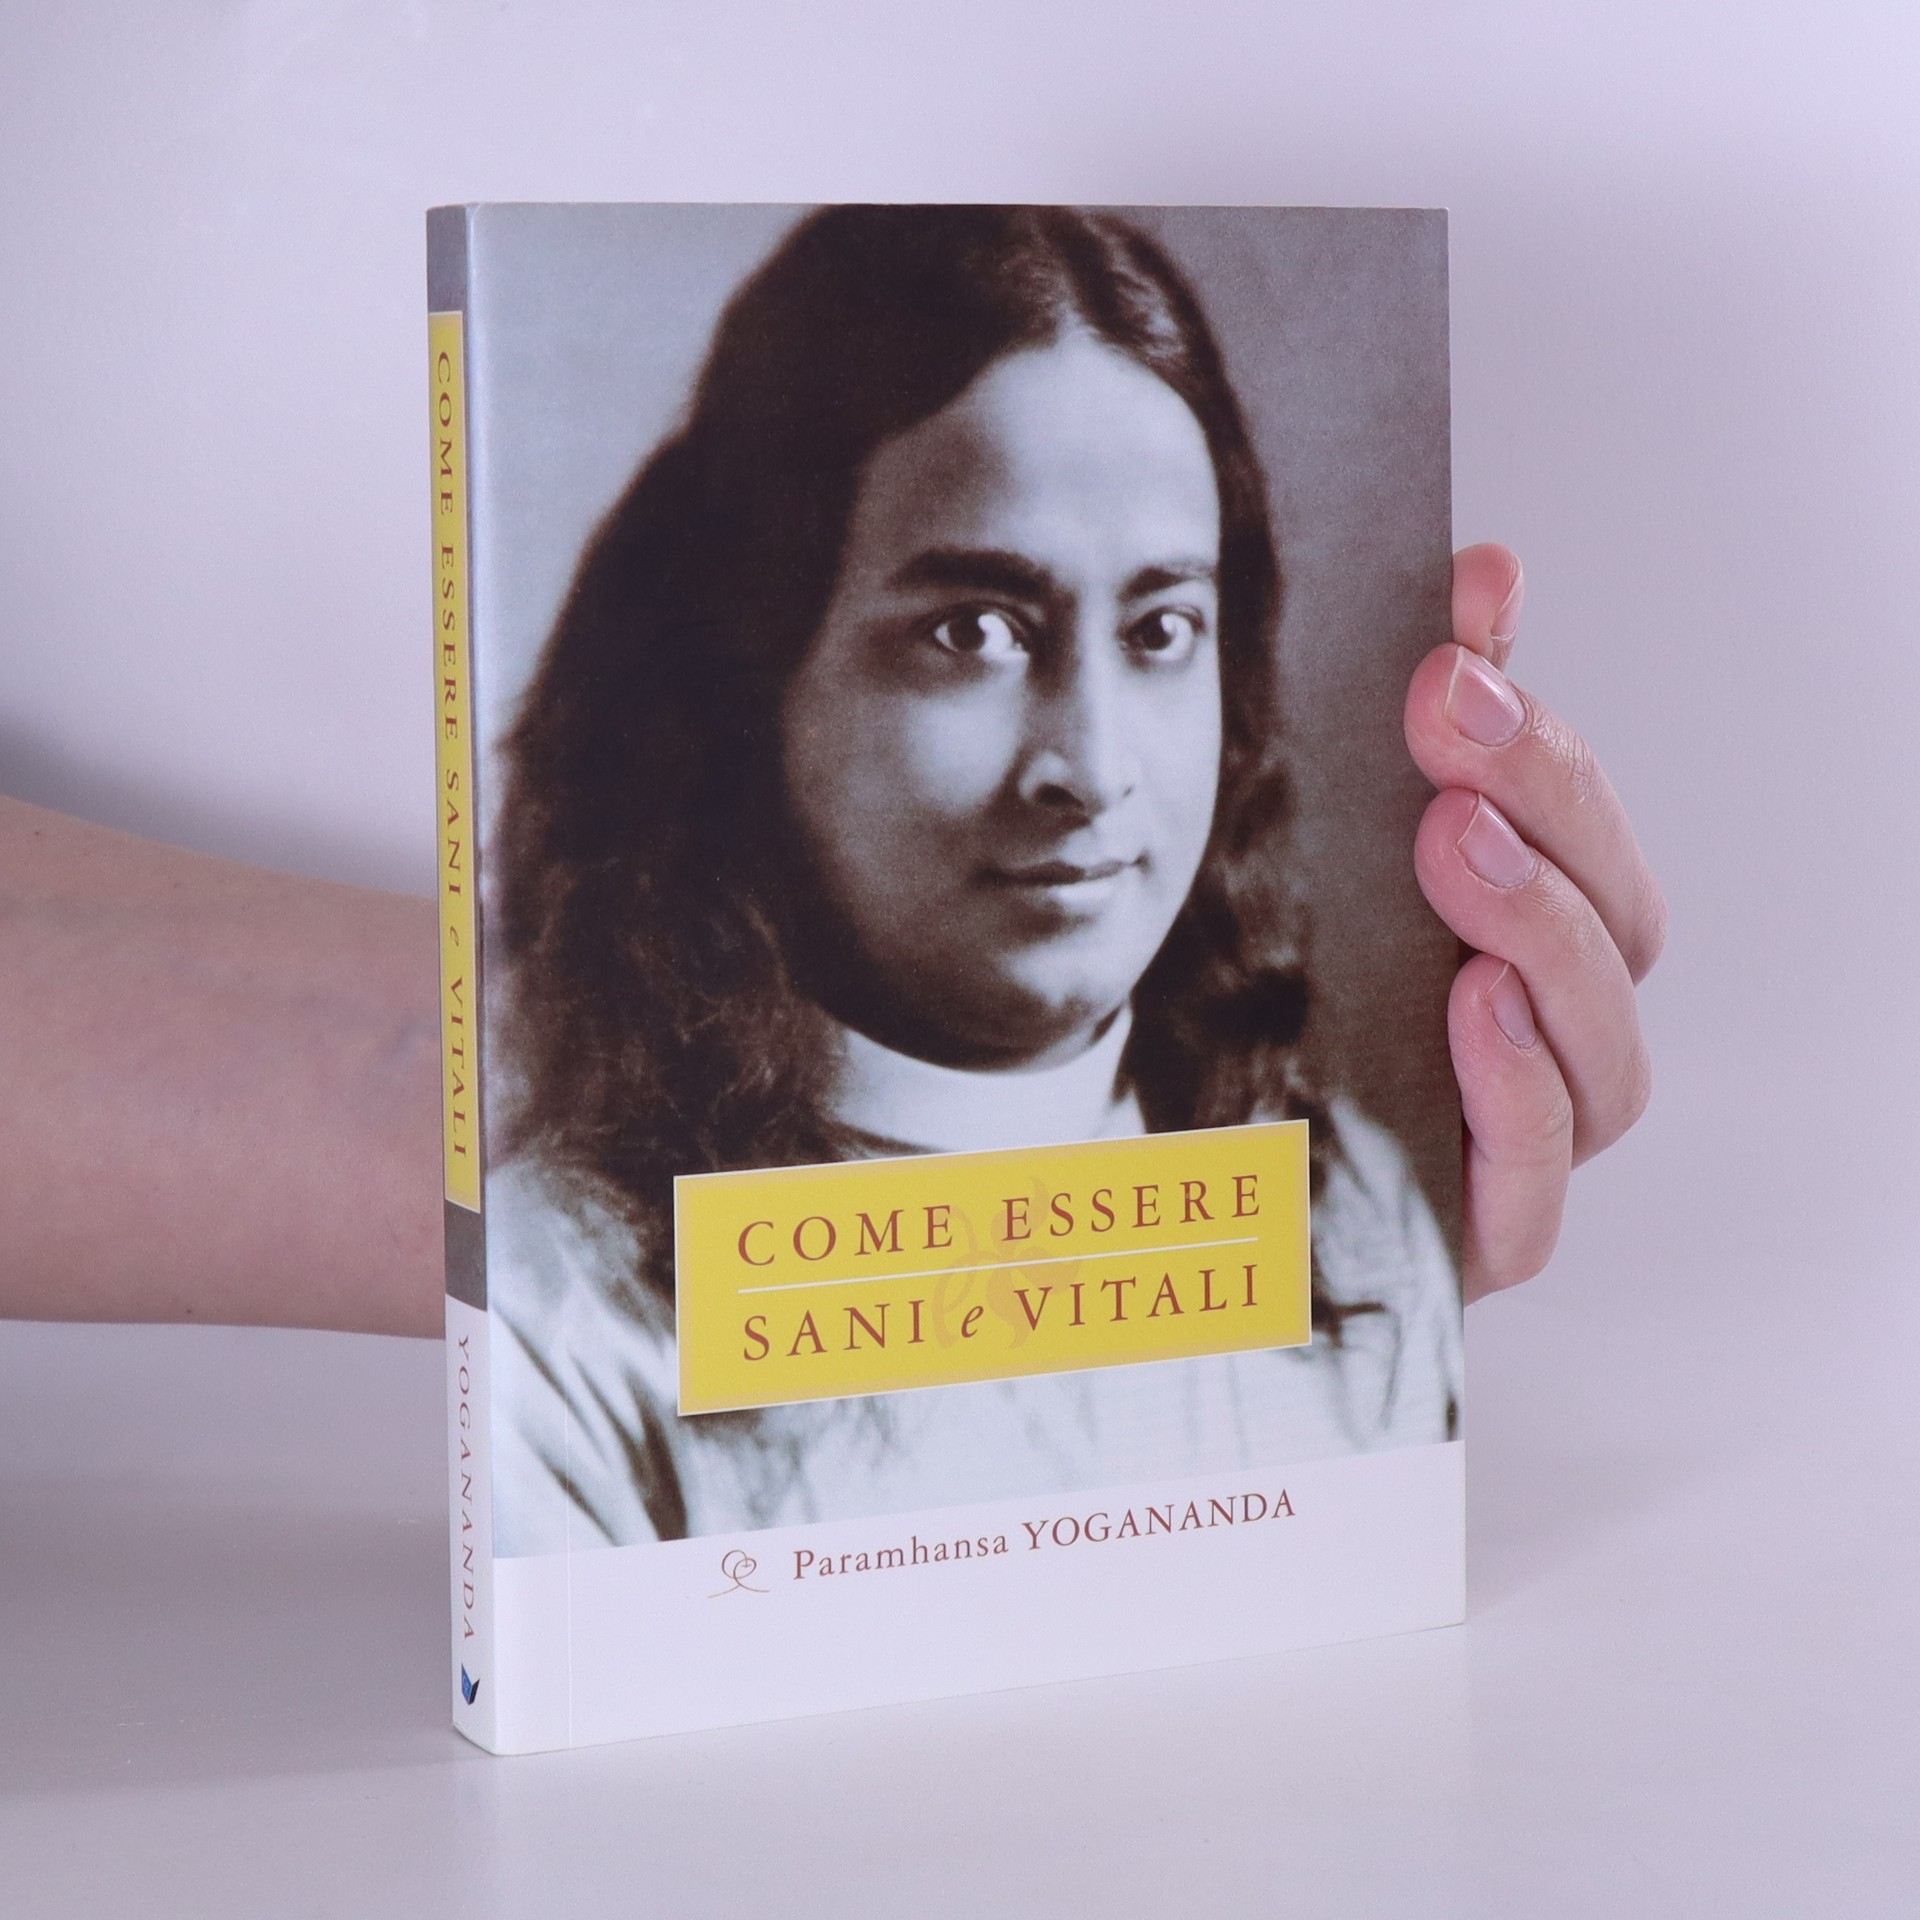 antikvární kniha Come essere sani e vitali, 2013